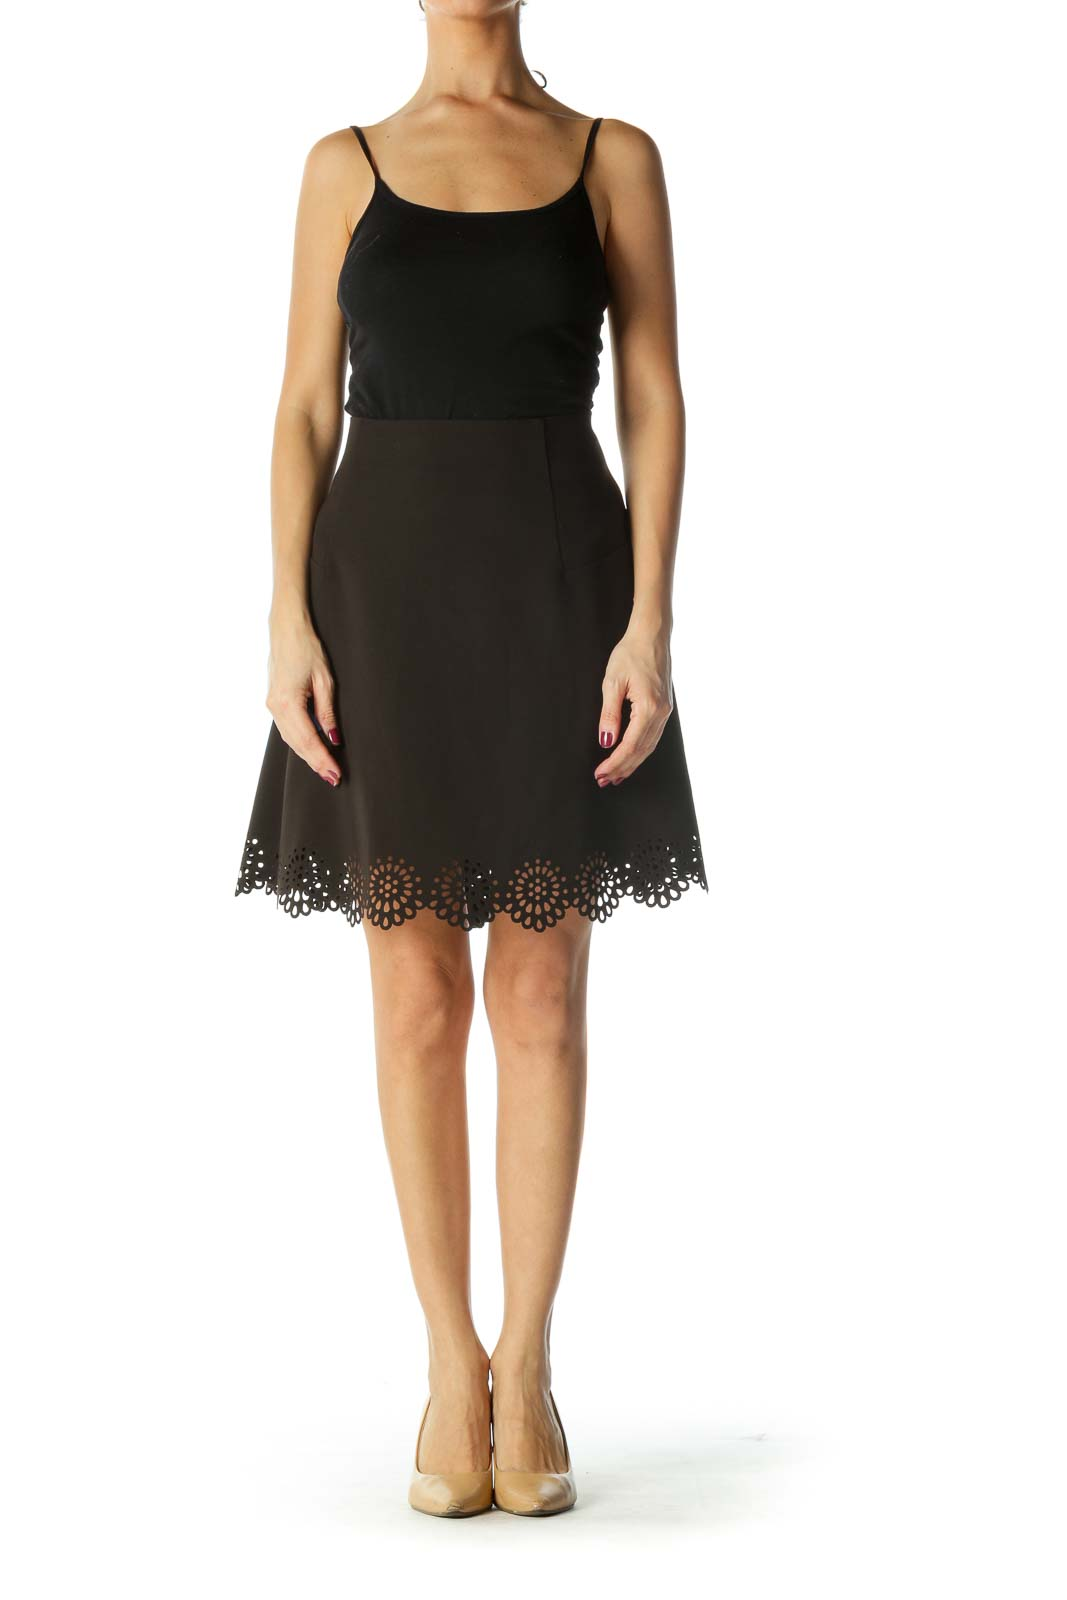 Black High Waisted Lazer Cut Flared Skirt